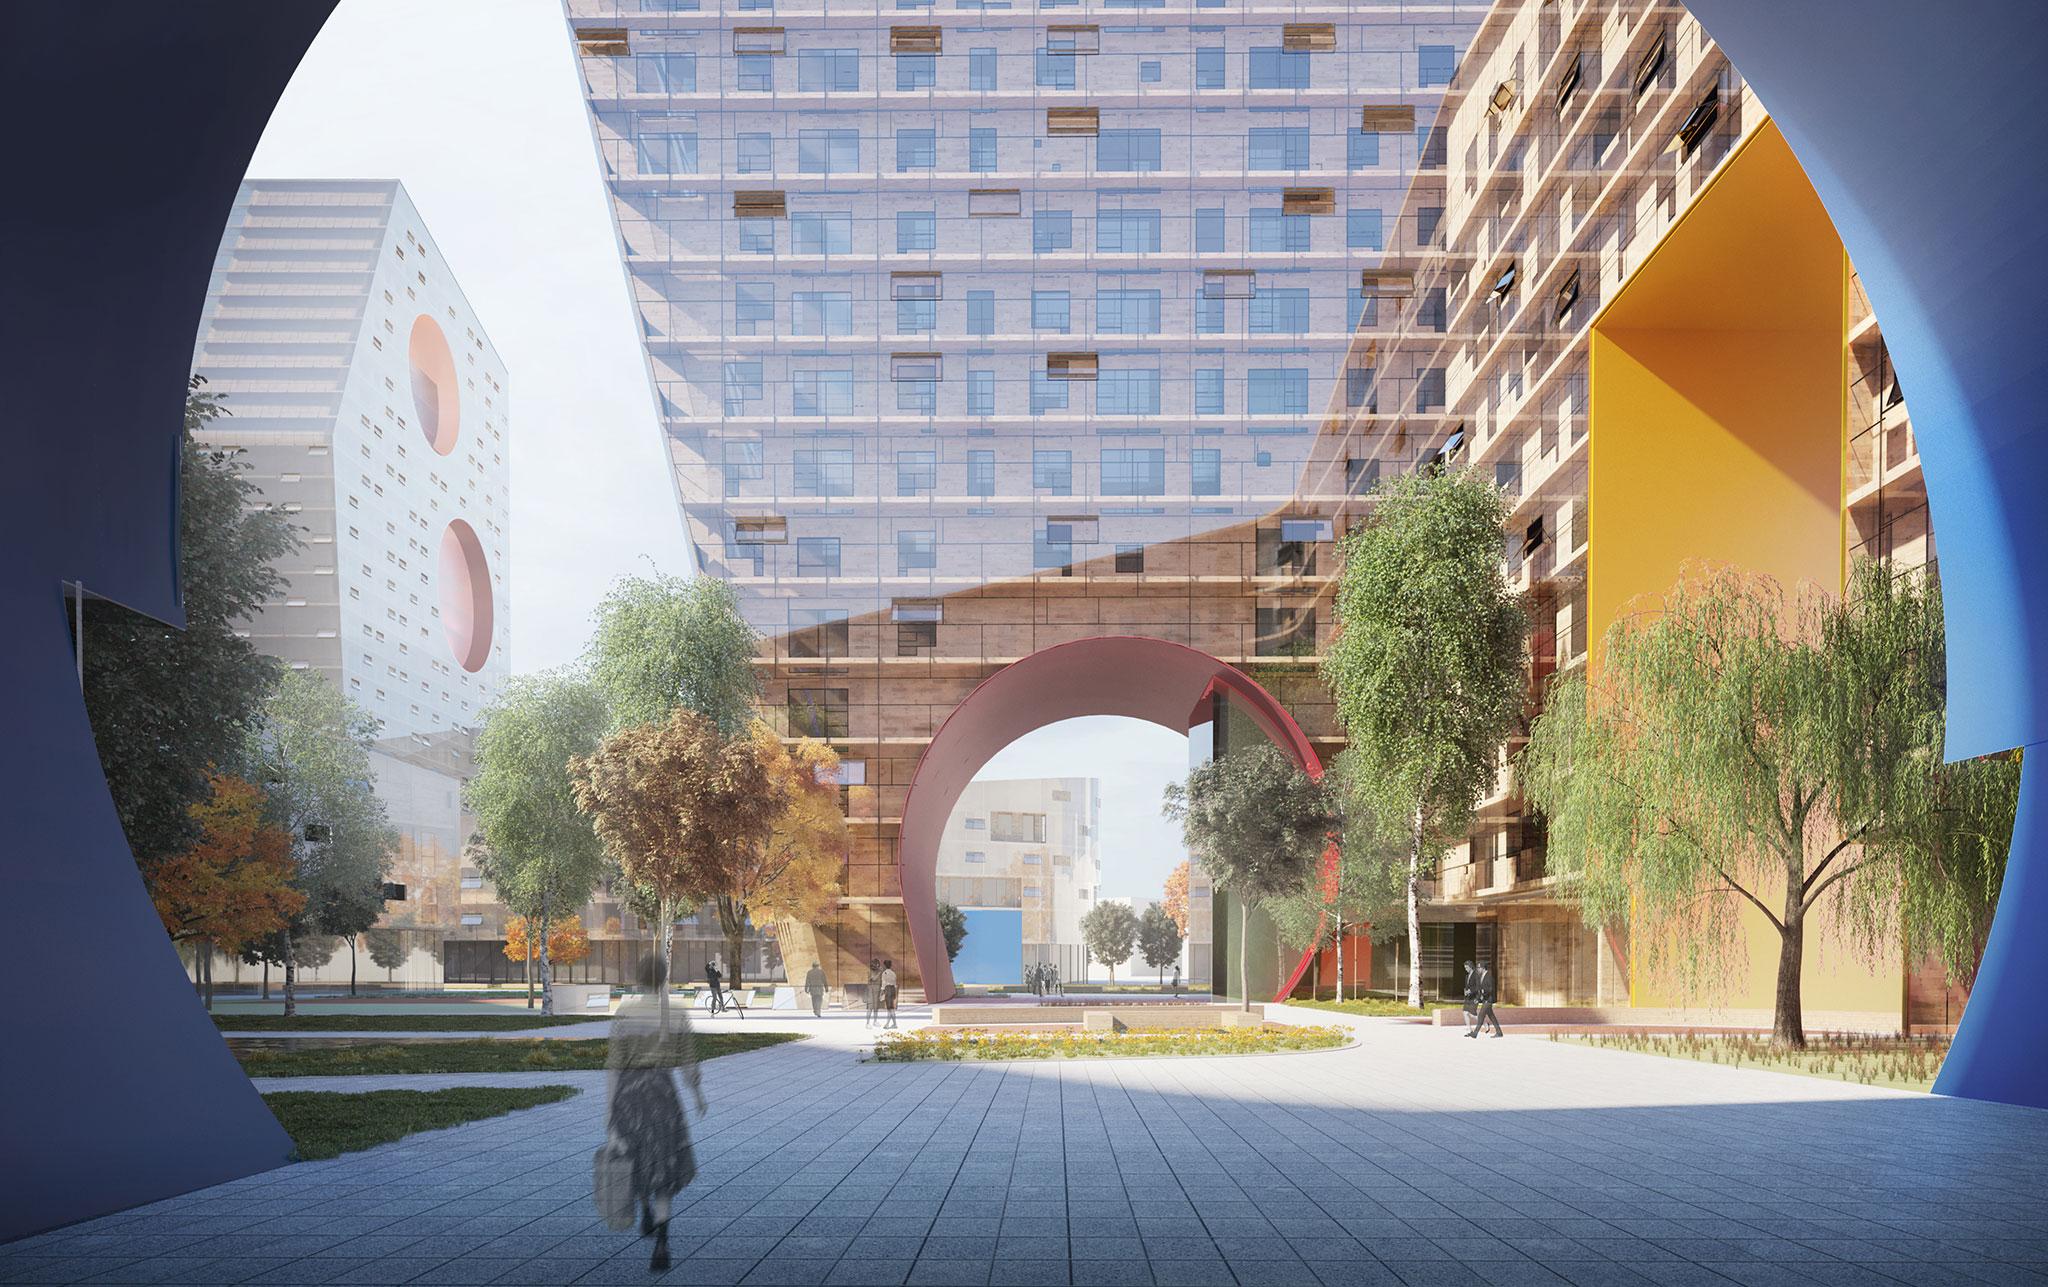 Steven Holl Architects Wins International Design